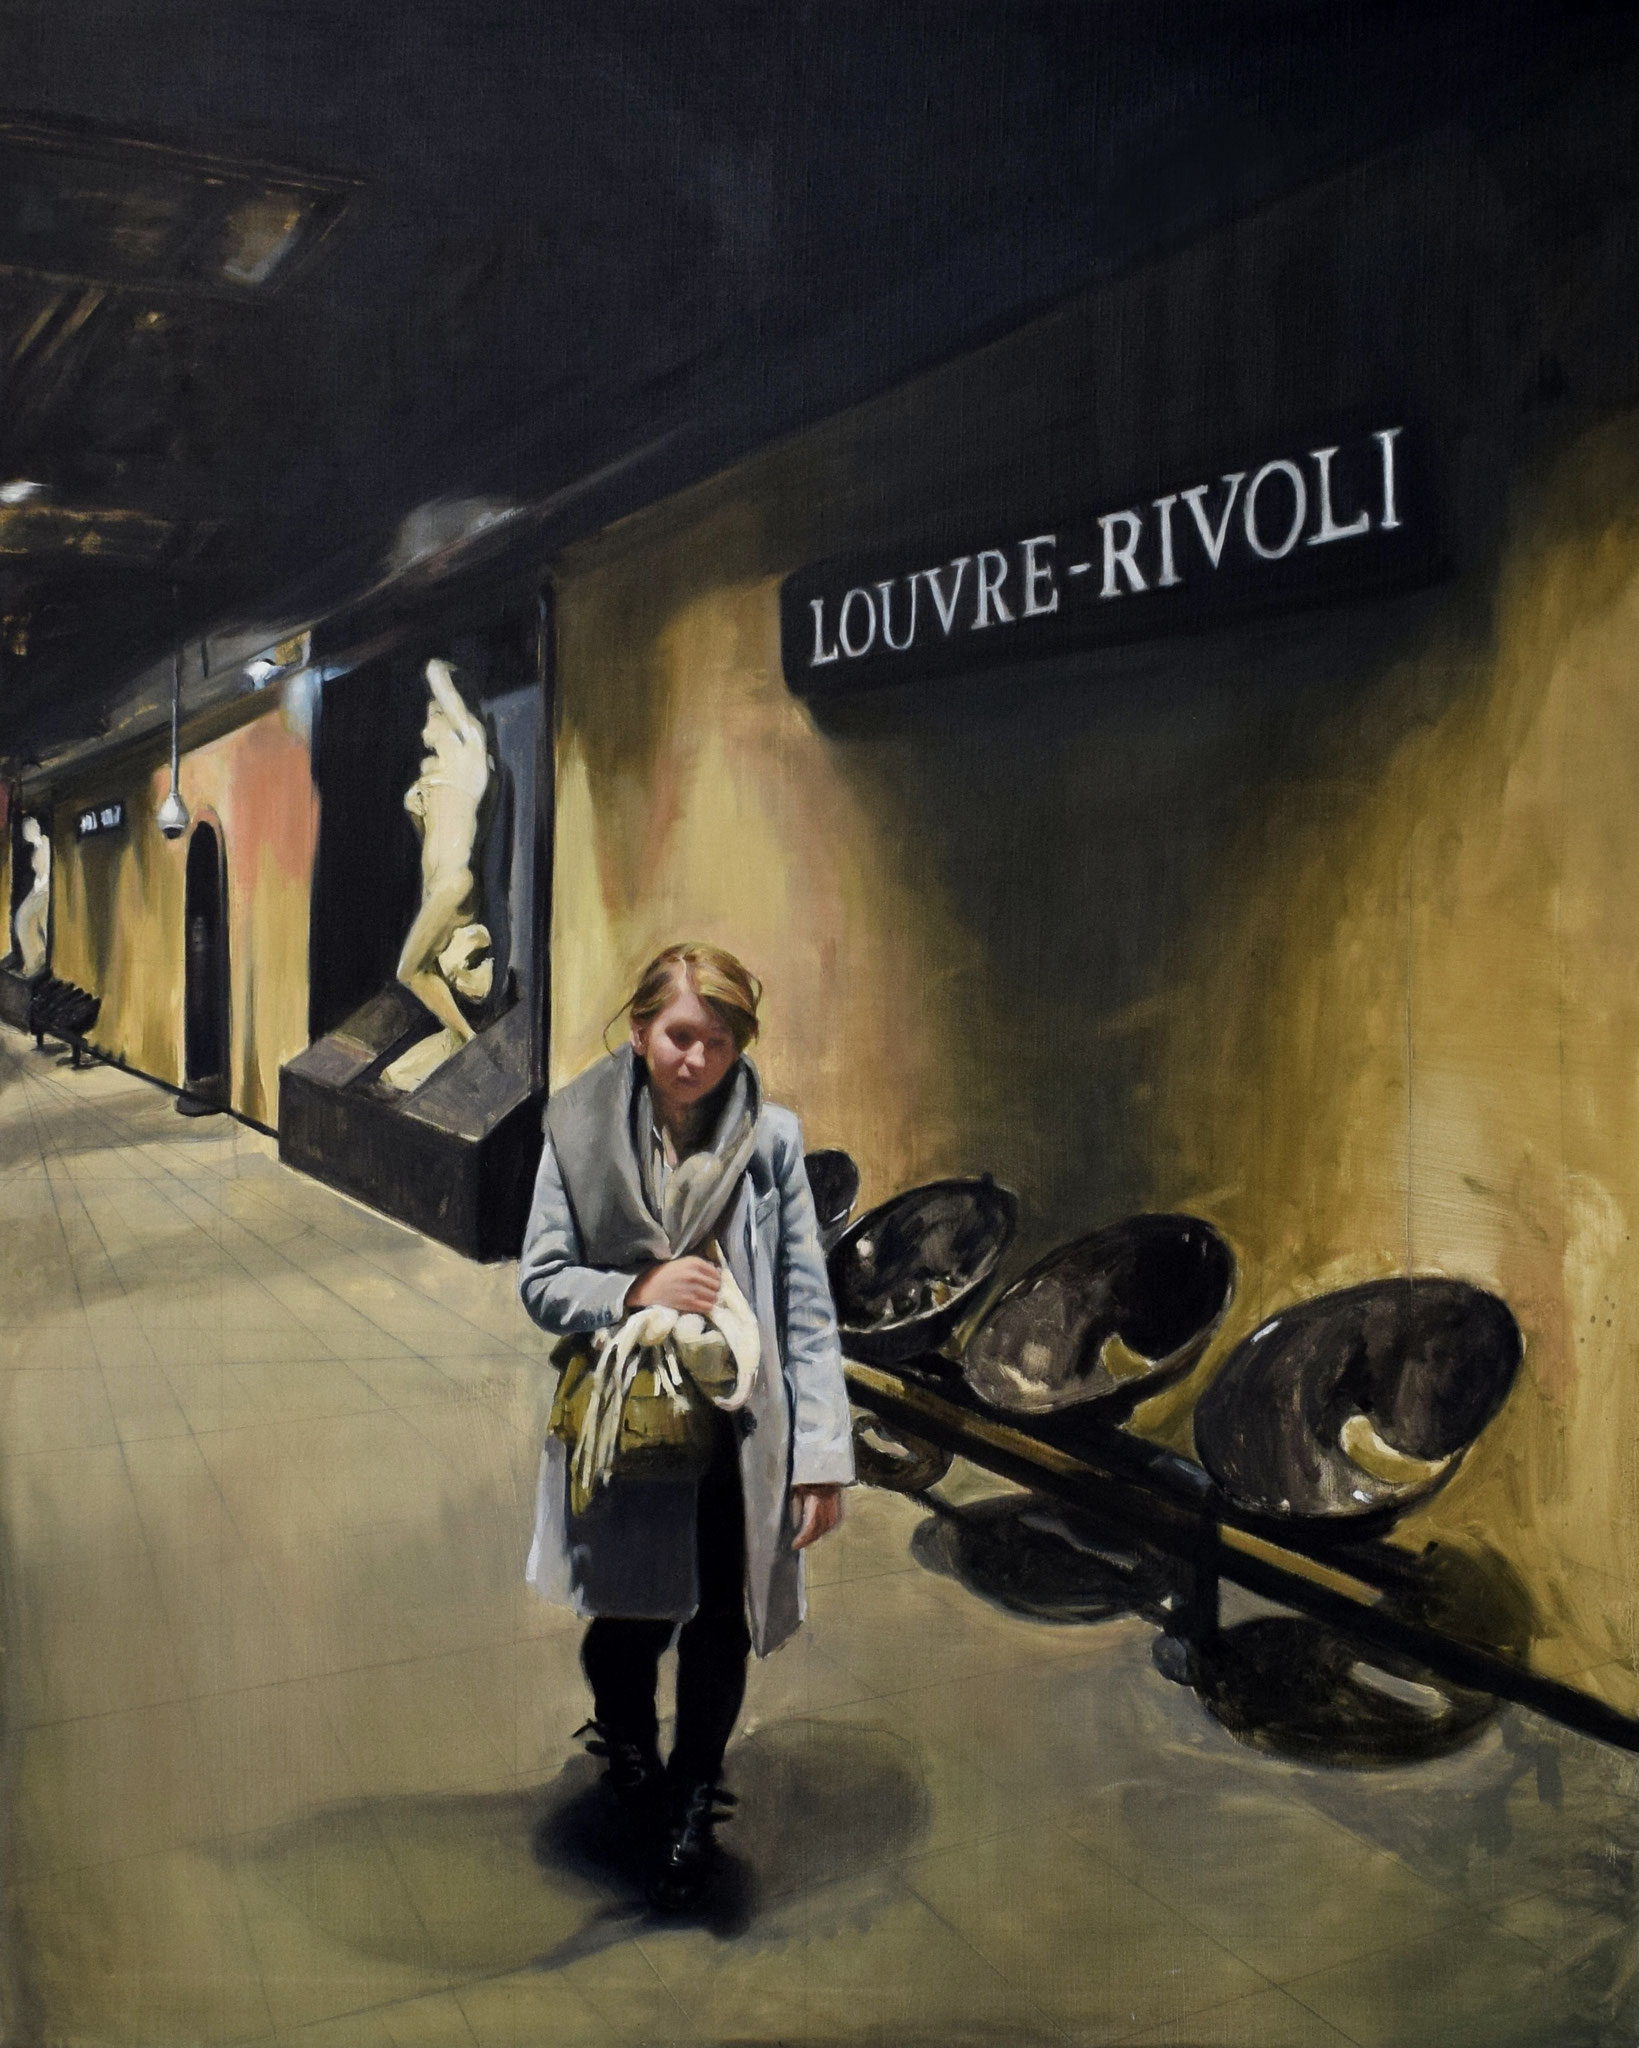 Rivoli Huile sur toile 162x130 2019